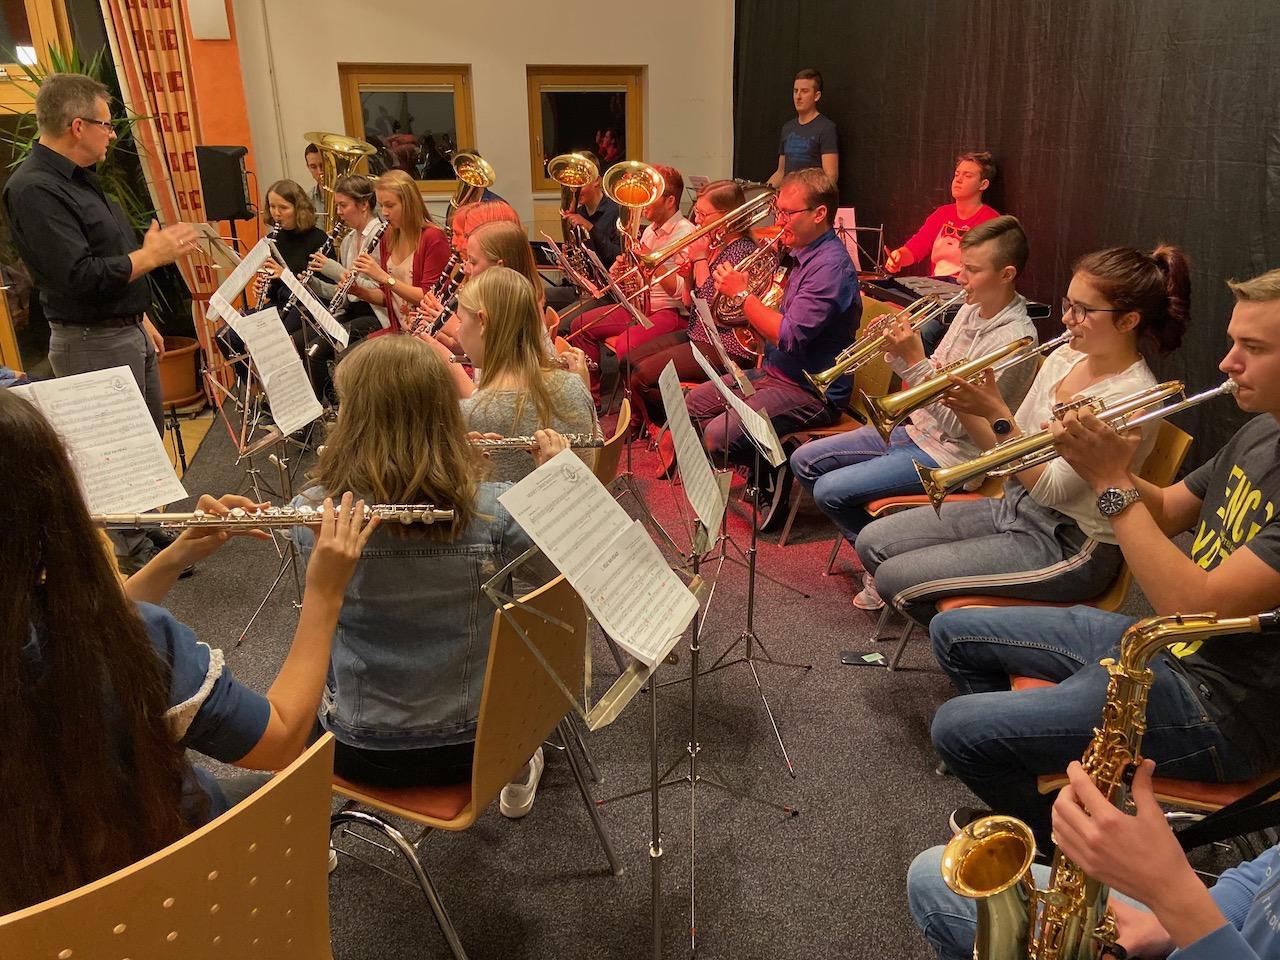 Weihnachtskonzert der Musikschule 8. Dezember 2019